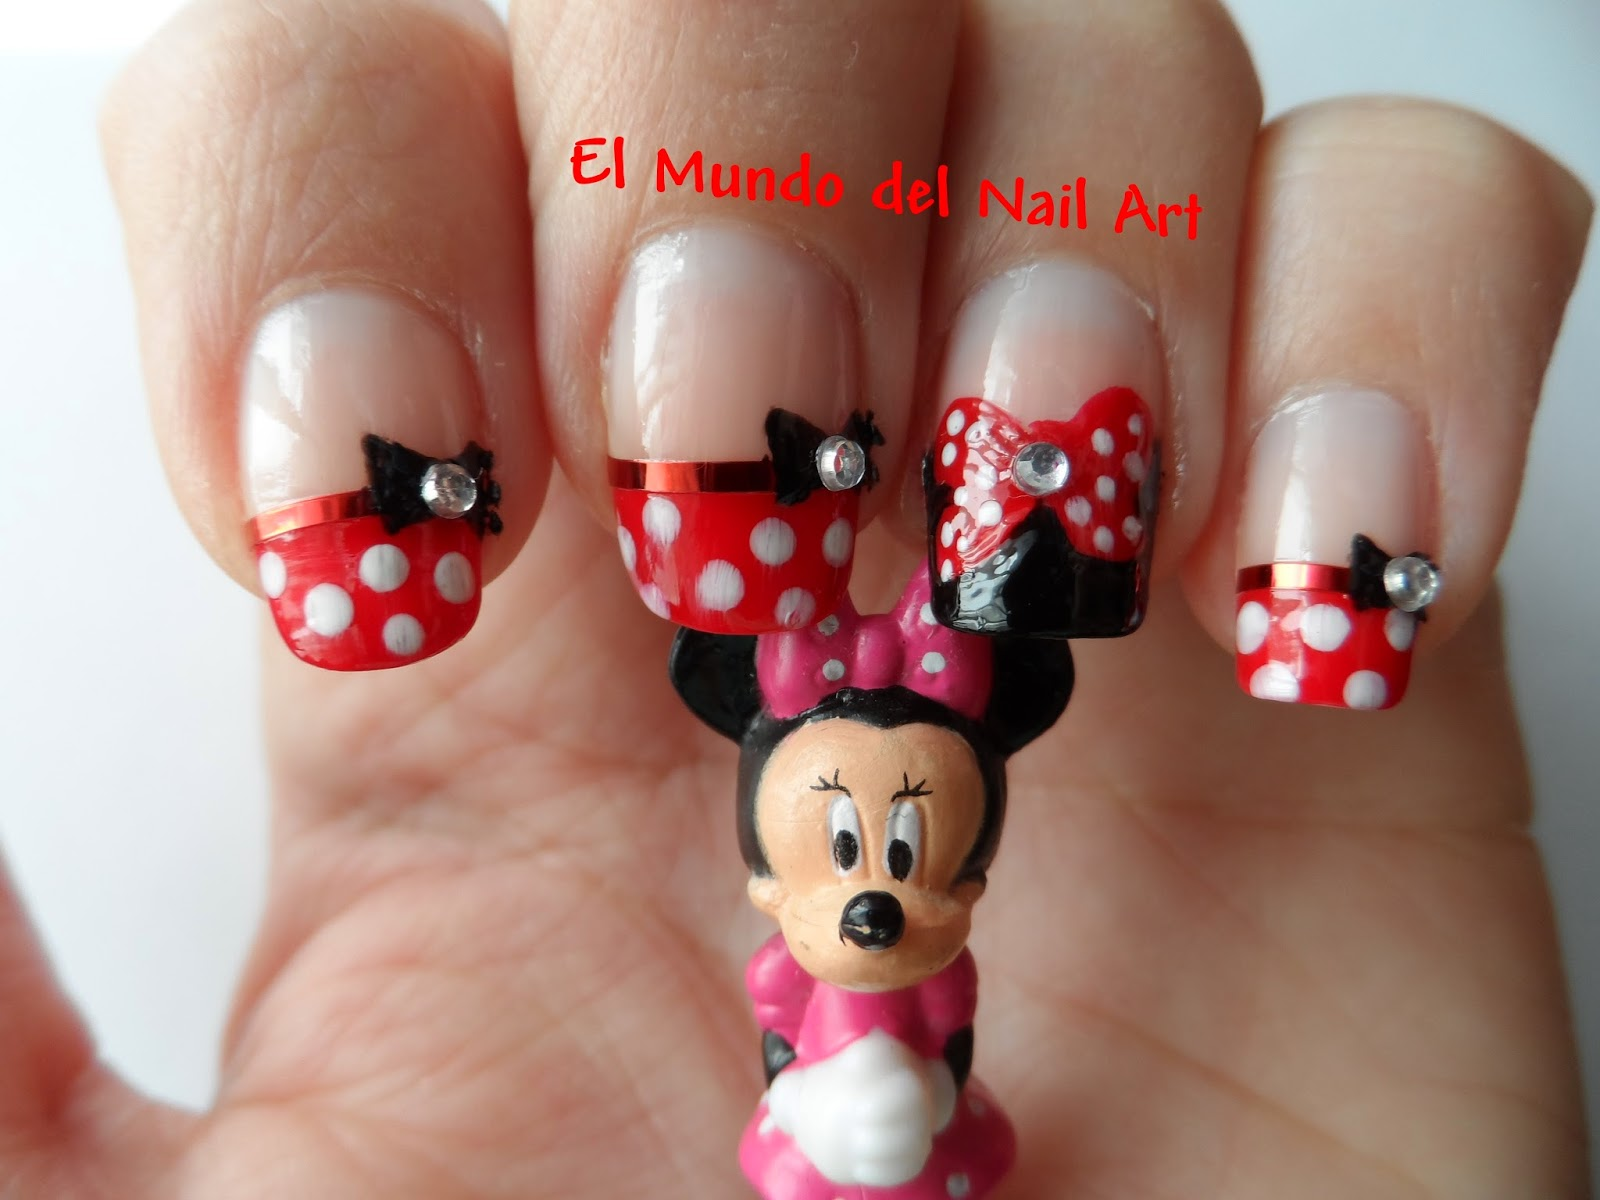 El Mundo del Nail Art: Manicura Minnie Mouse